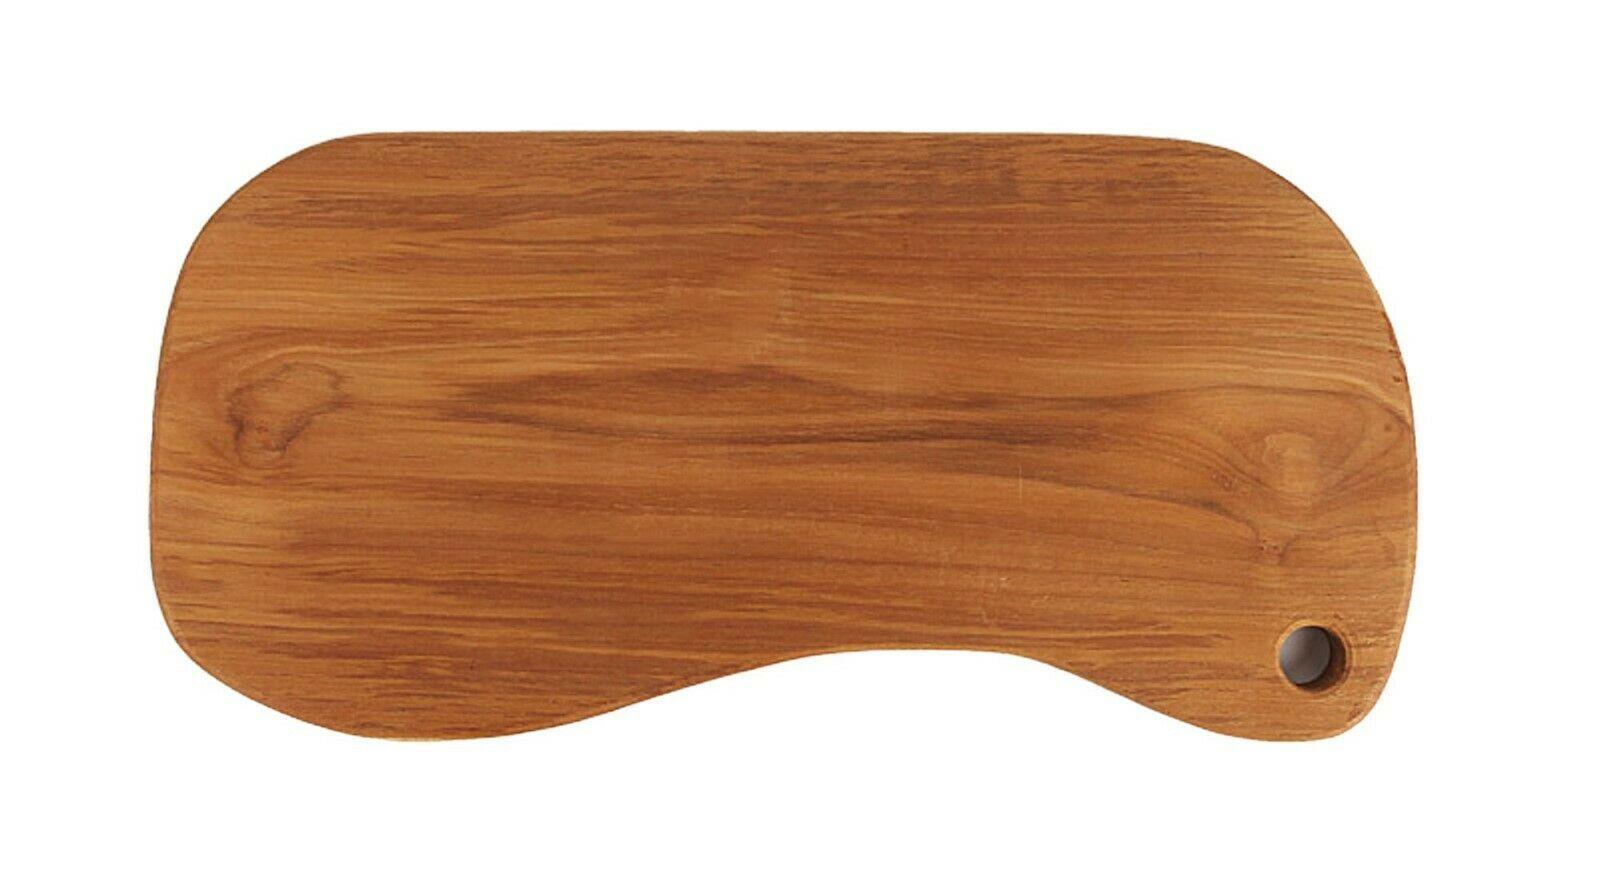 Loyal Adams Teak Sono Kitchen Peanut Wooden Serving Chopping Cutting Bread Board